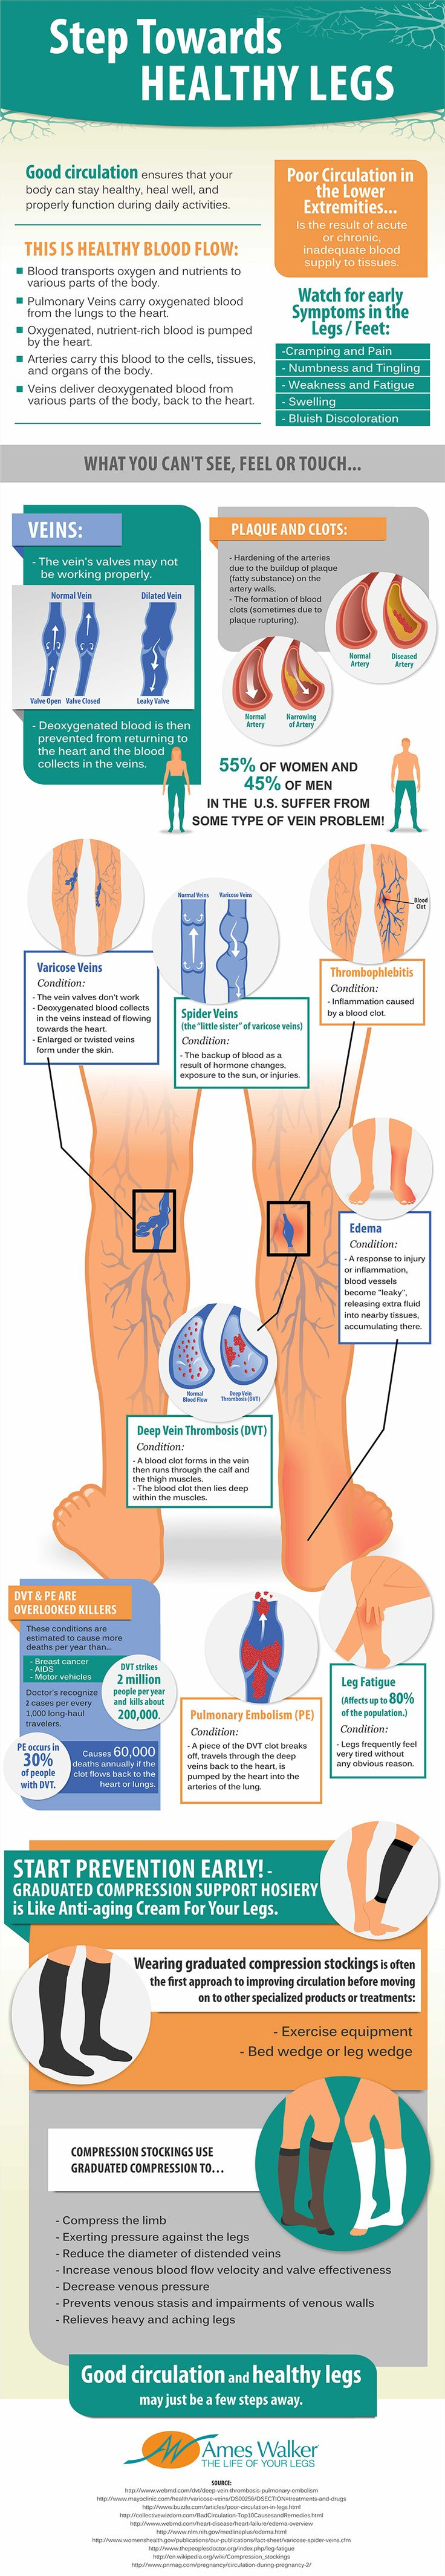 Step Towards Healthy Legs